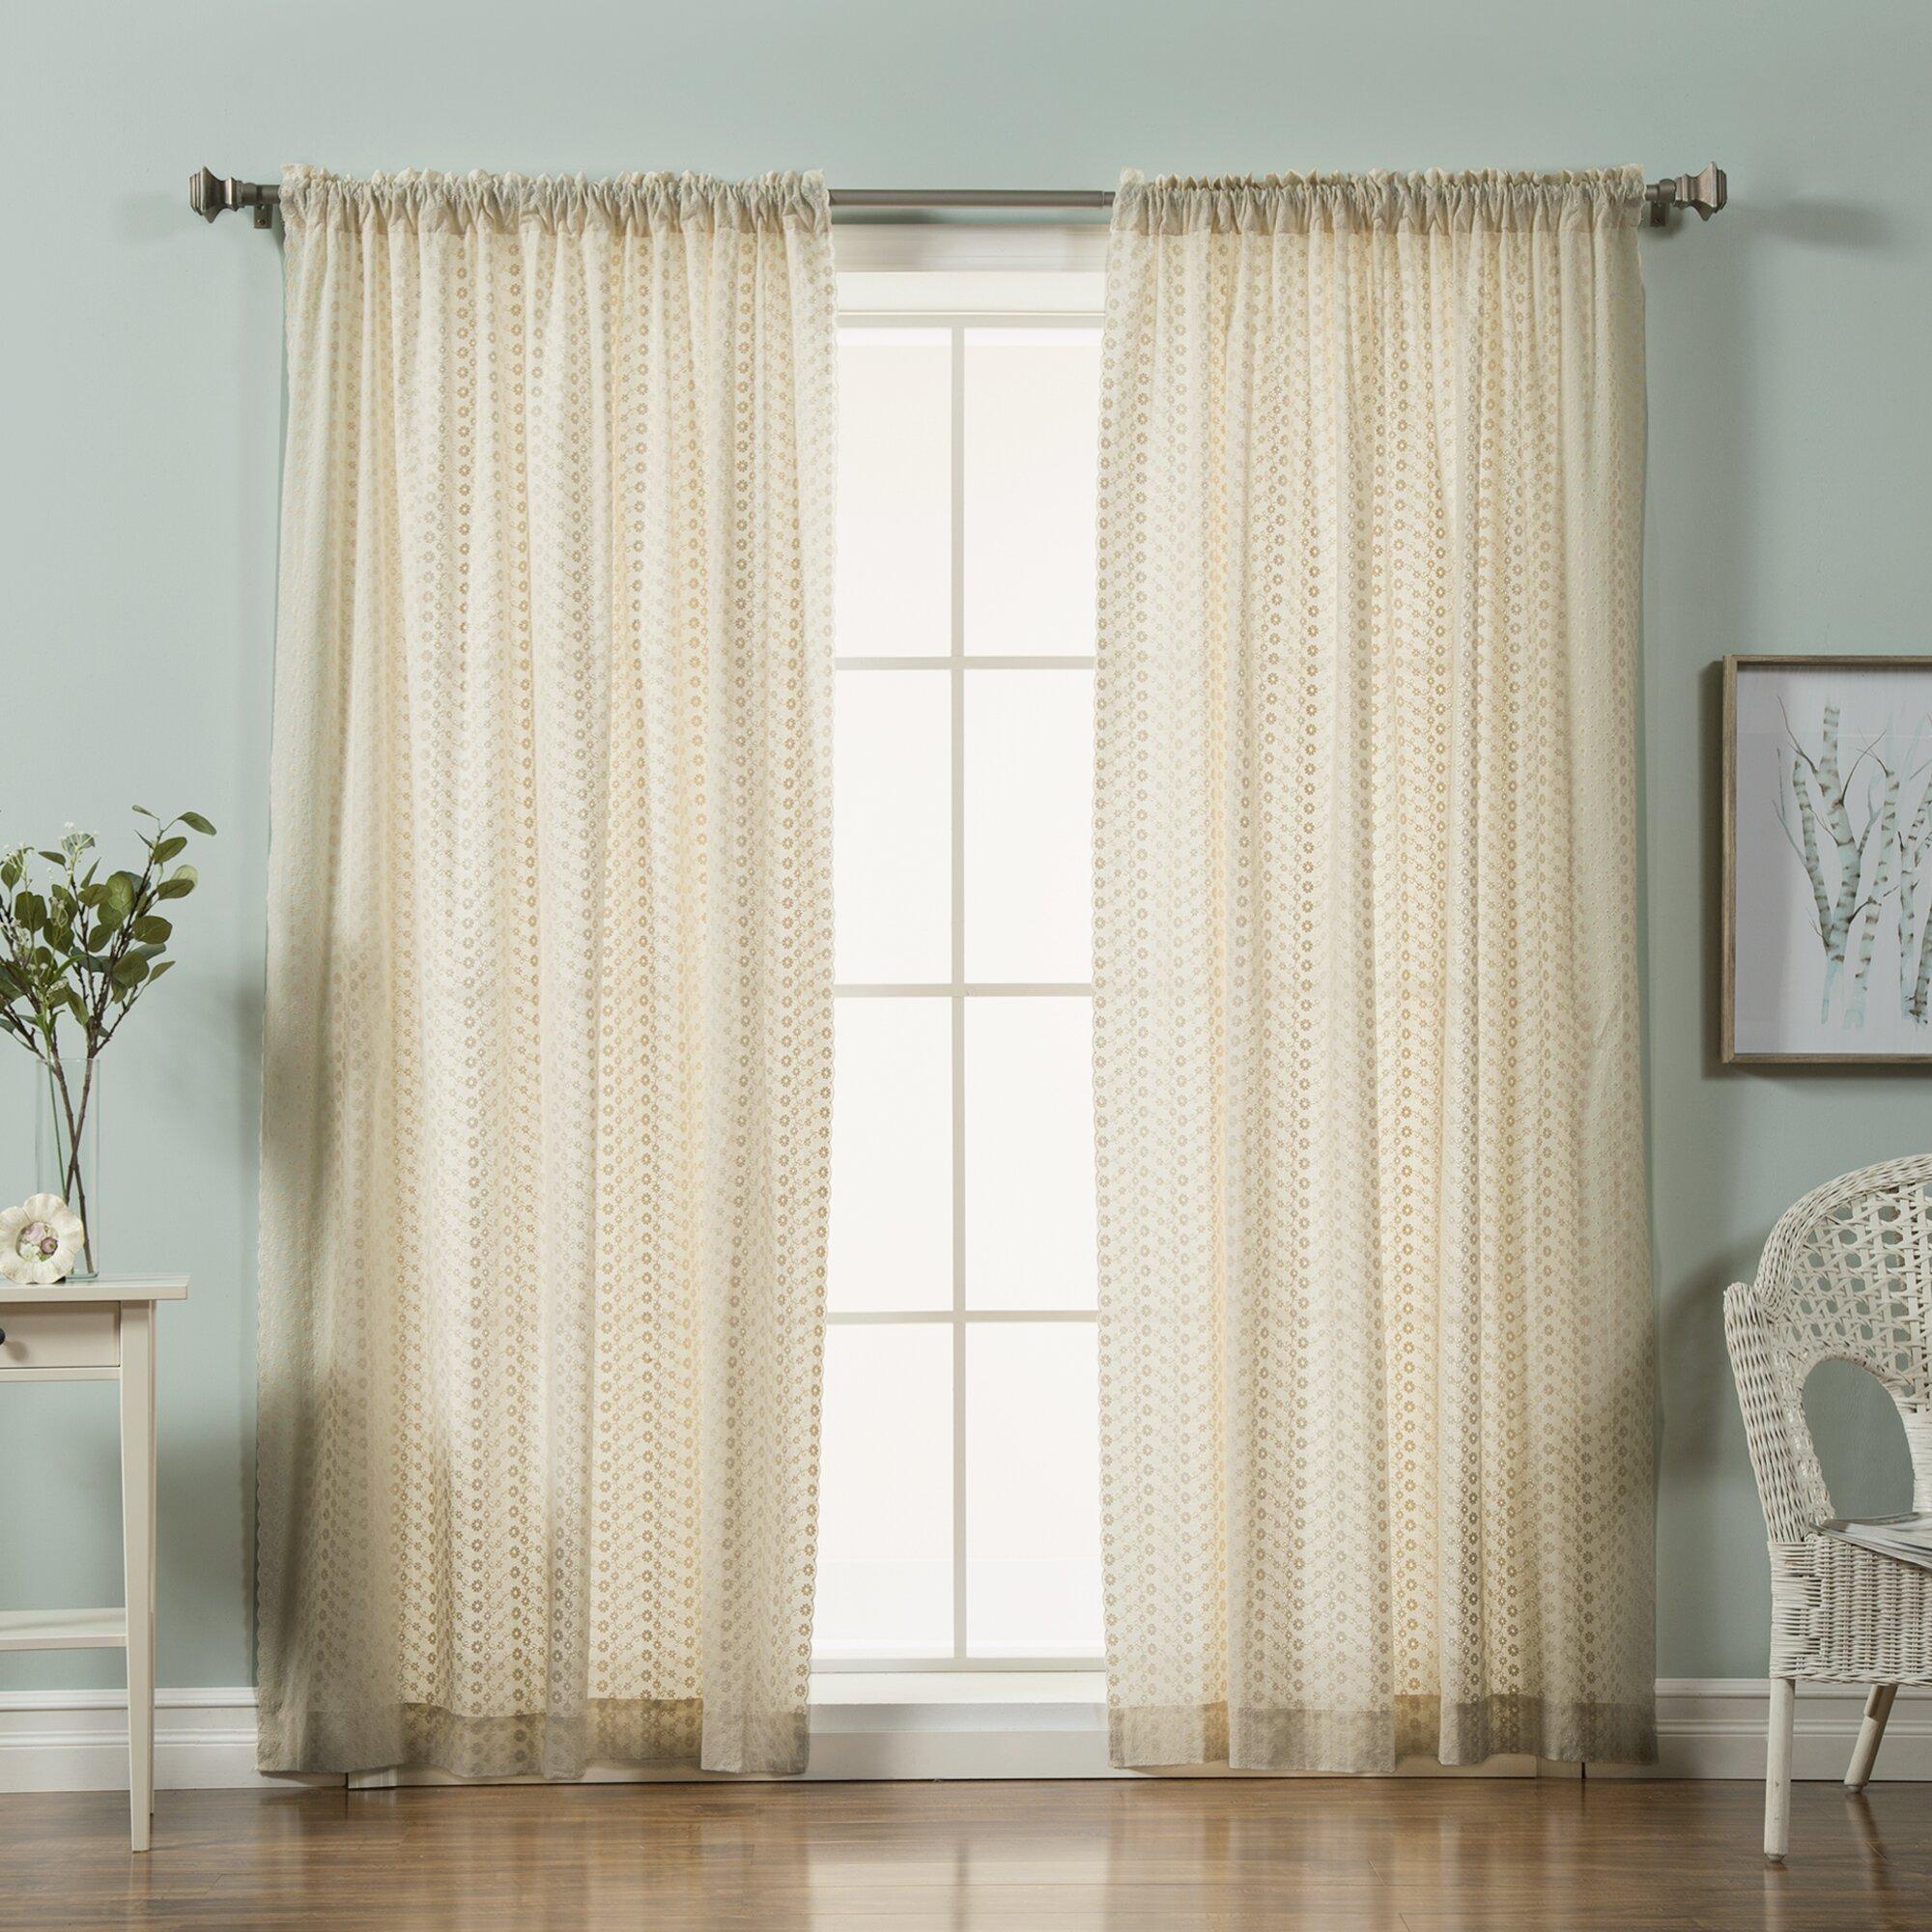 Best Home Fashion Inc Mini Nature Floral Semi Sheer Tab Top Curtain Panels Reviews